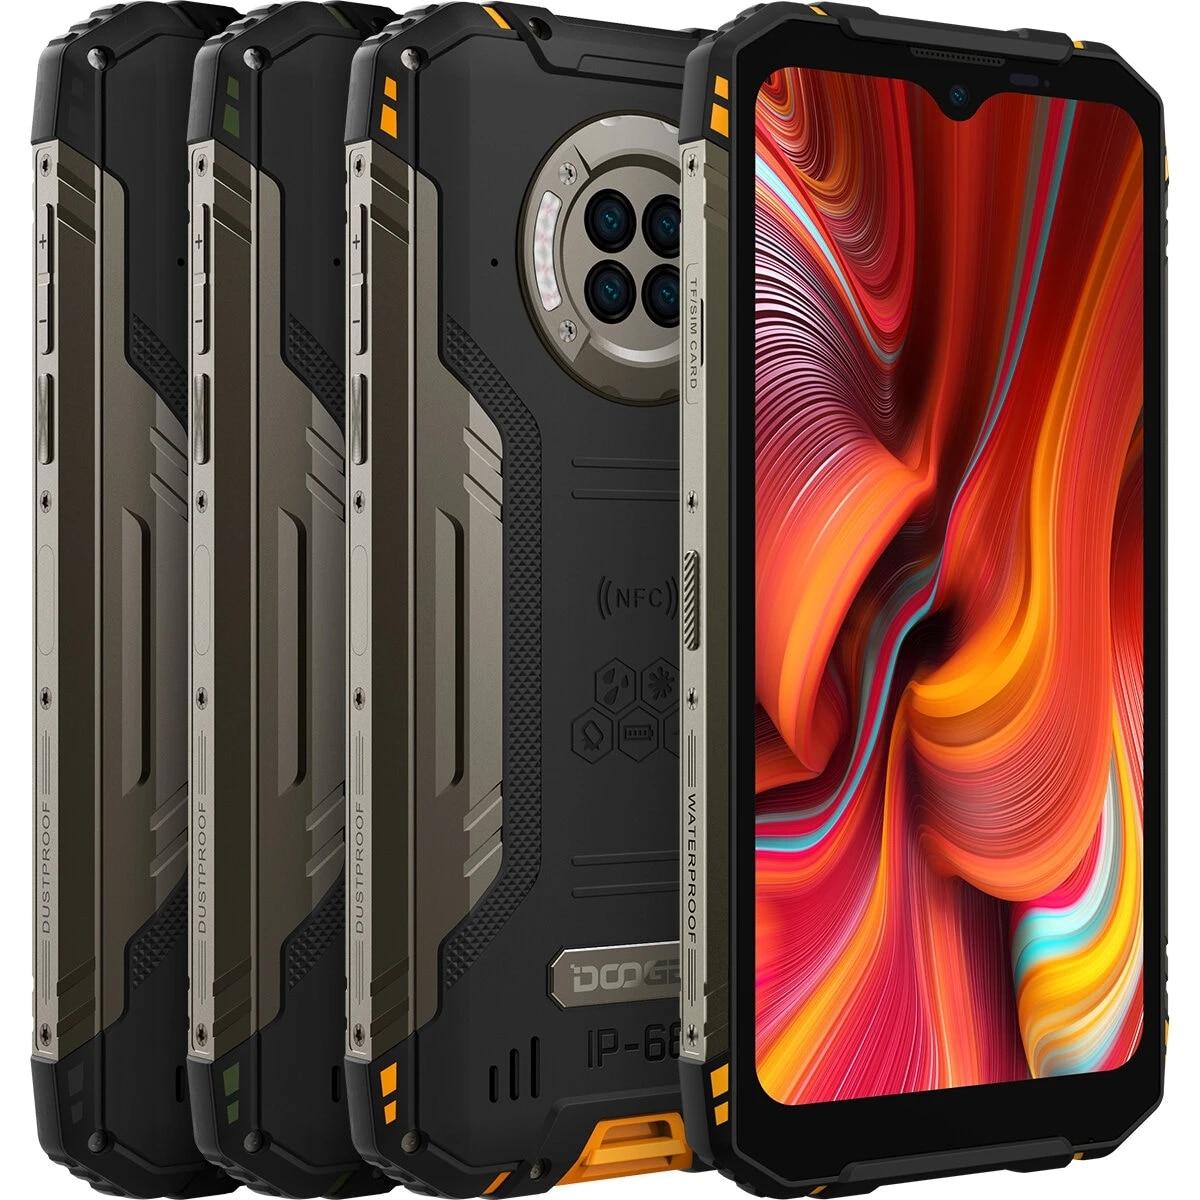 Смартфон DOOGEE S96 Pro защищенный, IP68 + IPIP69K, 8 + 128 ГБ, Helio G90, NFC, Android 10, 6350 мА · ч, 6,22 дюйма, 48 МП